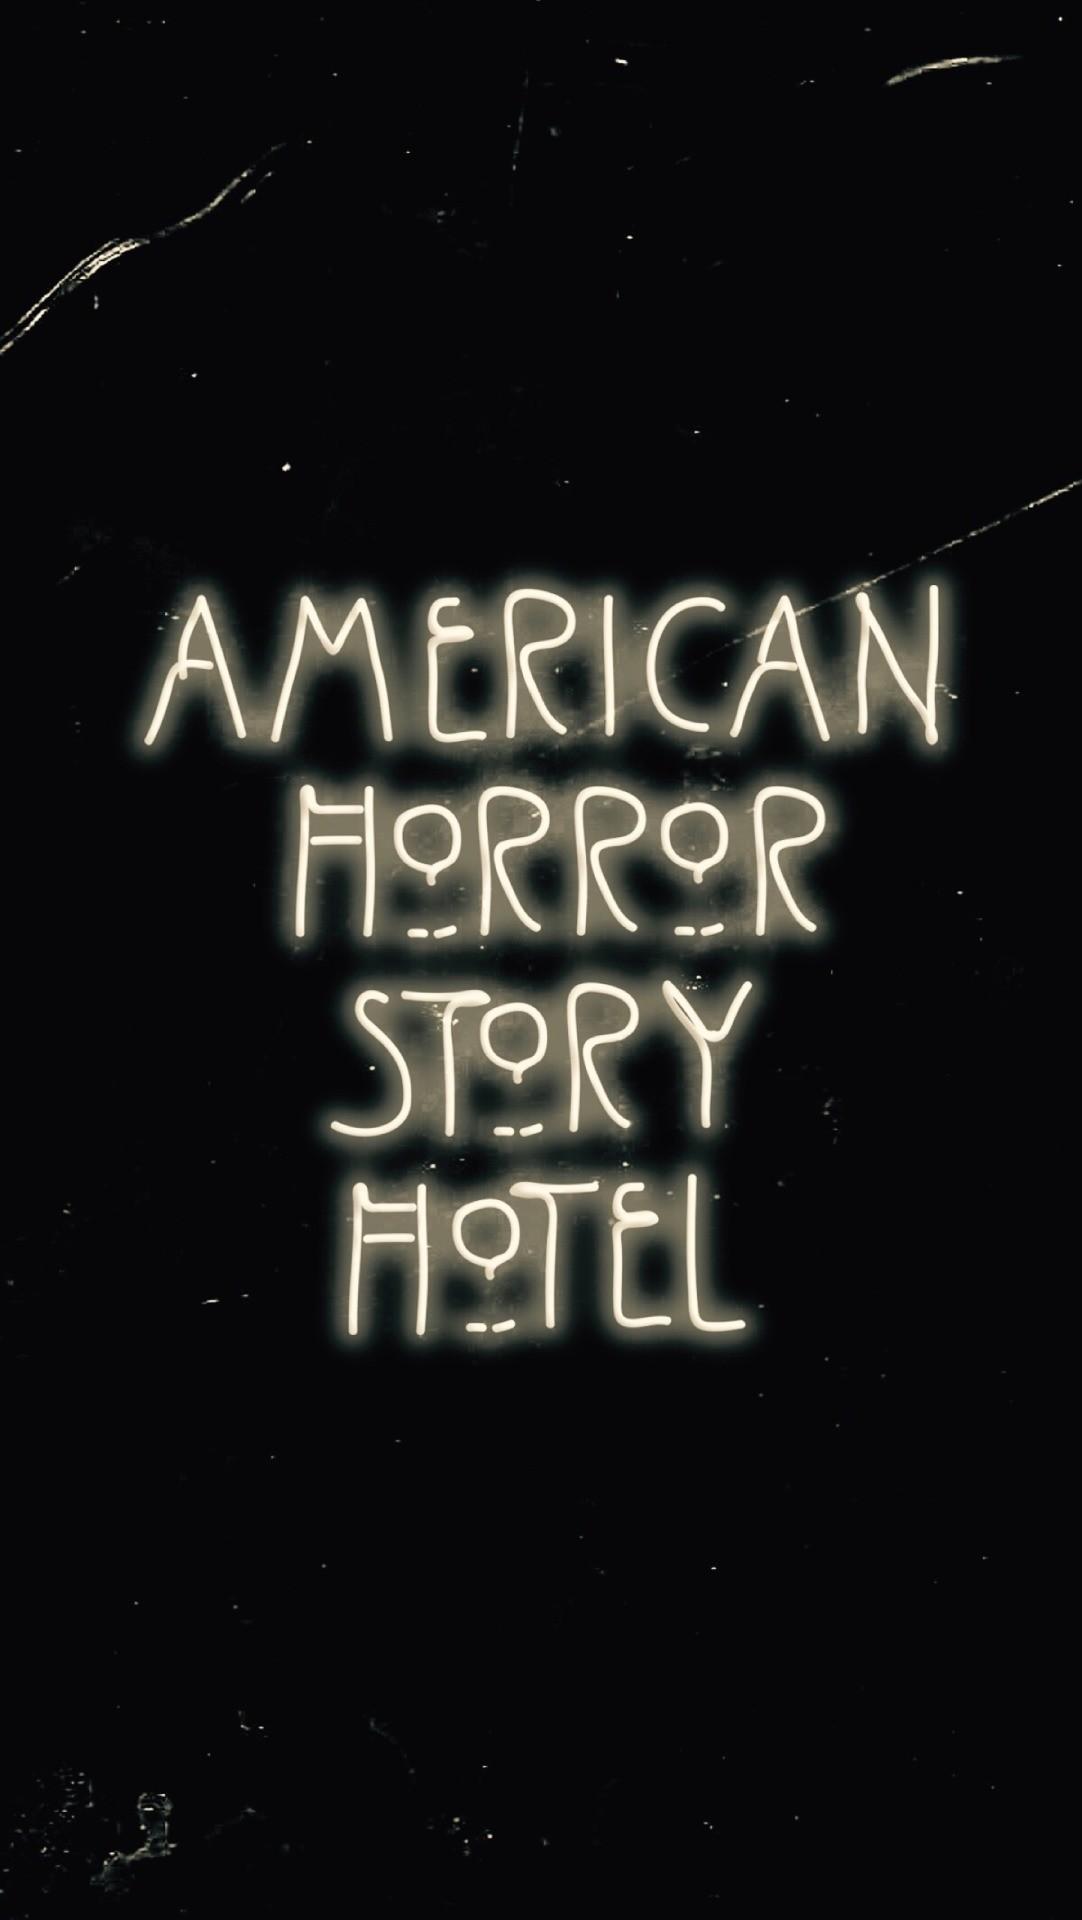 american horror story ahs ahs hotel ahs lockscreens american horror story  lockscreen lockscreens lockscreen evan peters